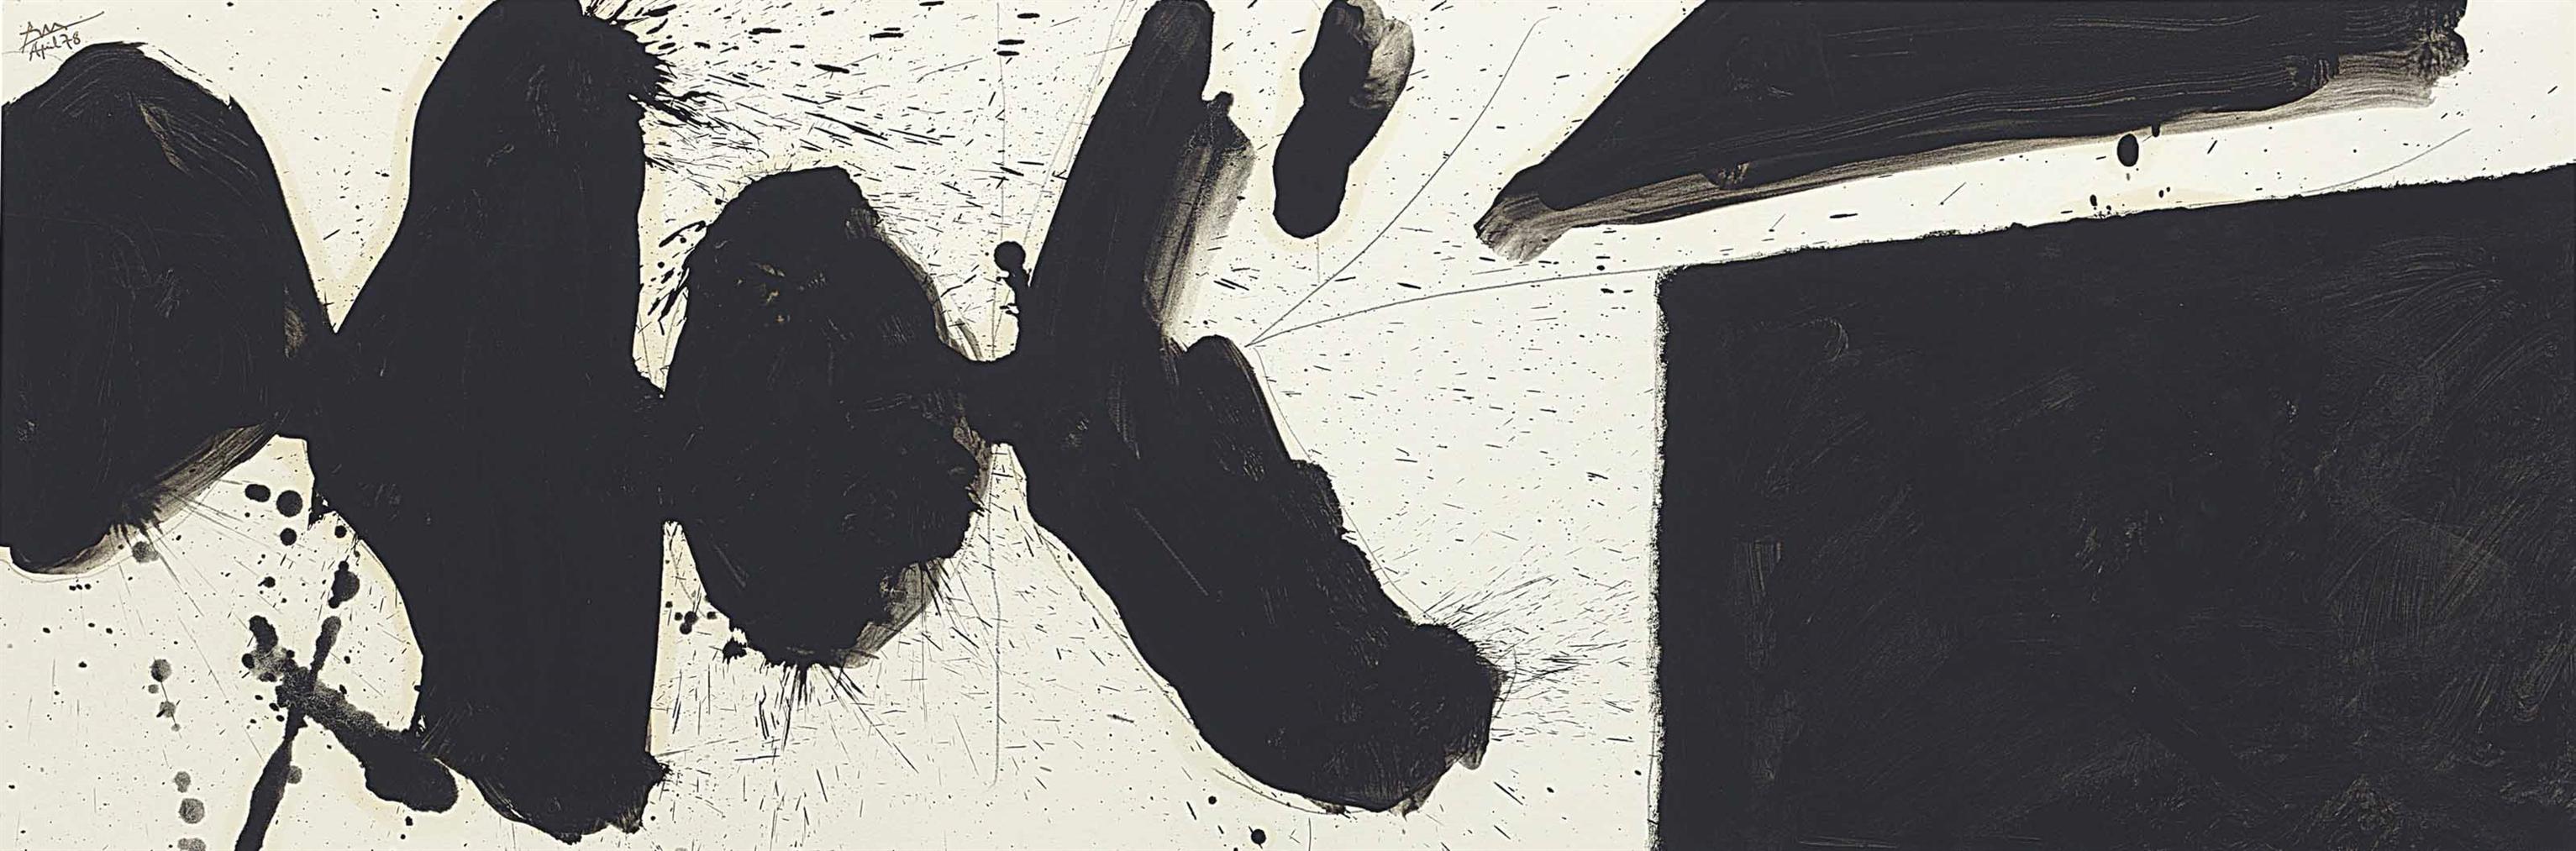 Robert Motherwell-Mural Study-1978